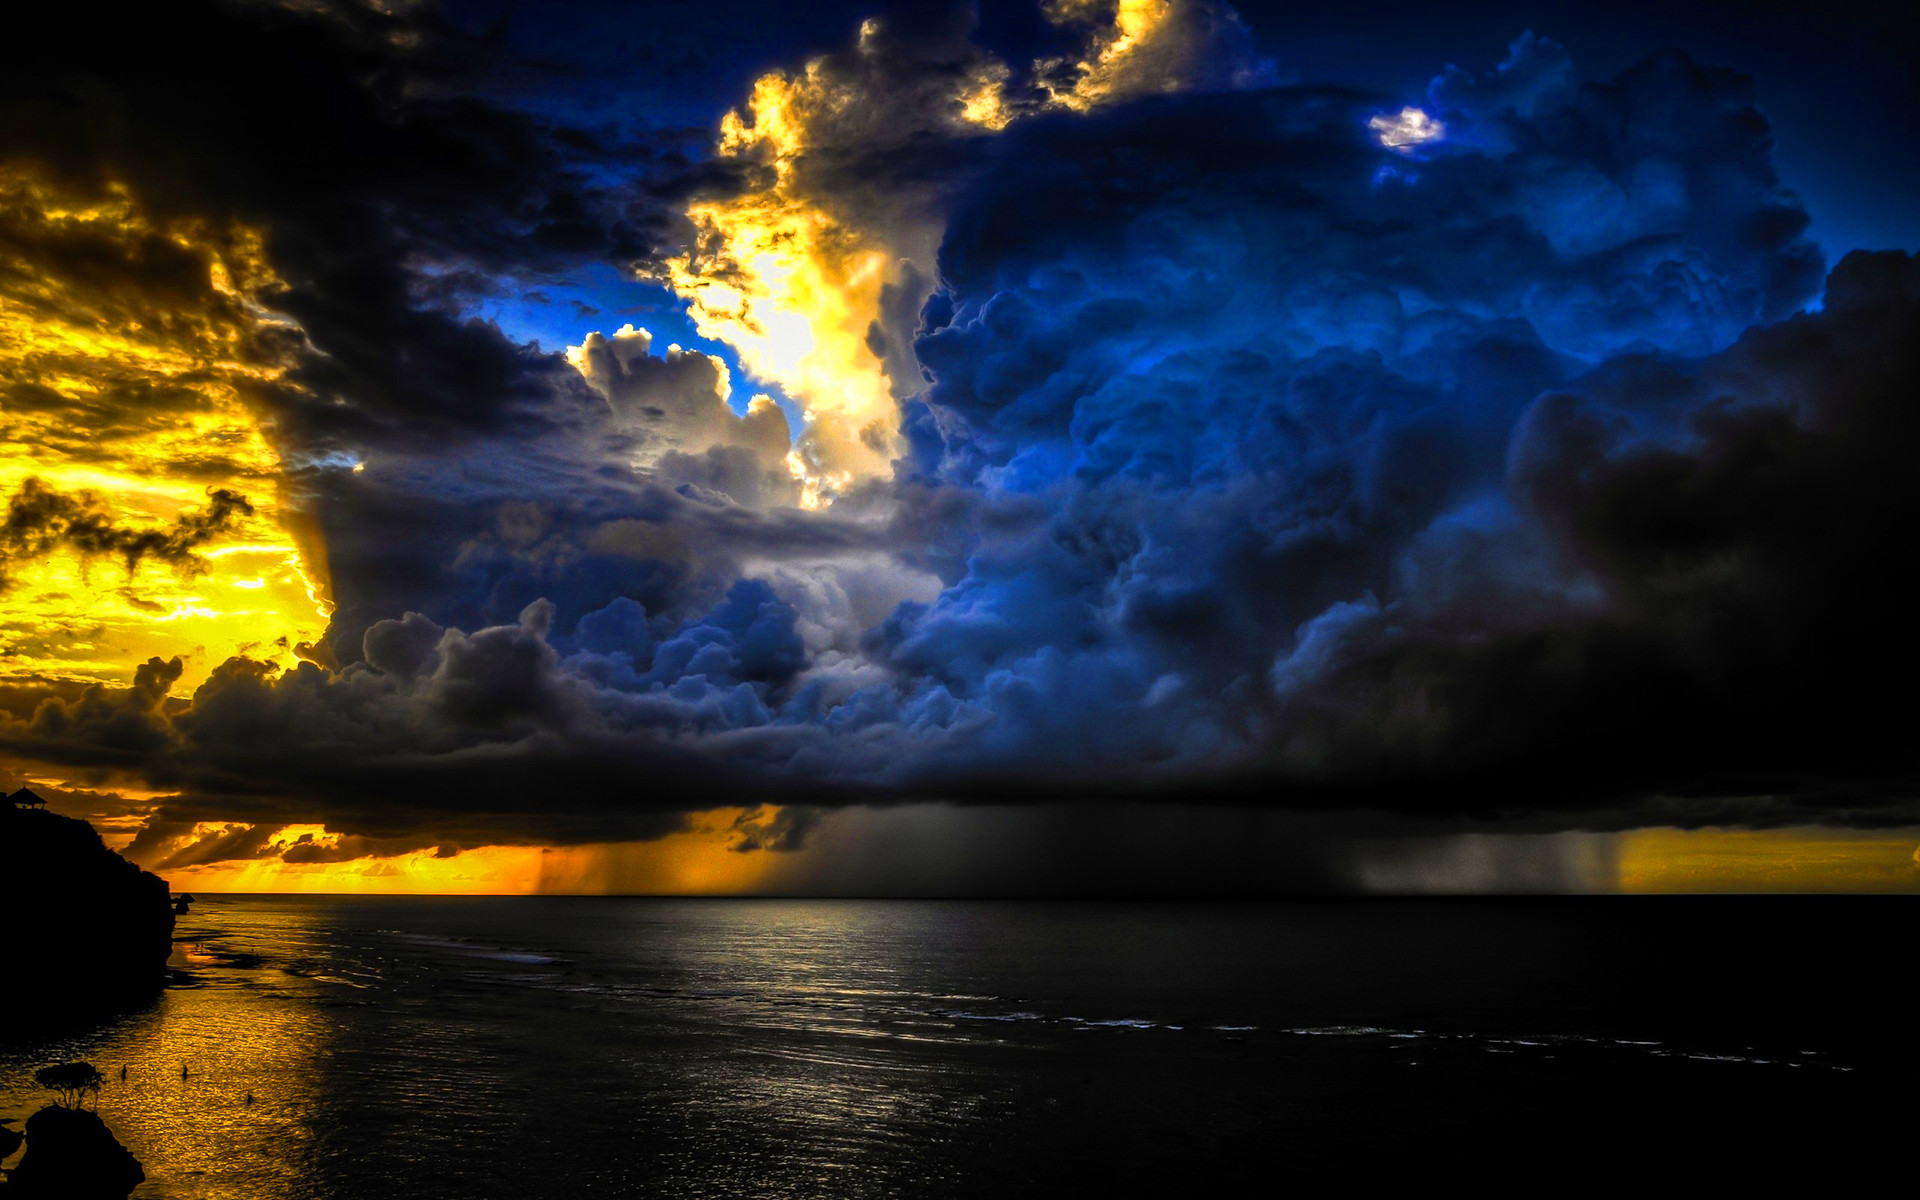 Storm Clouds Wallpapers: Storm Clouds Wallpaper (76+ Images